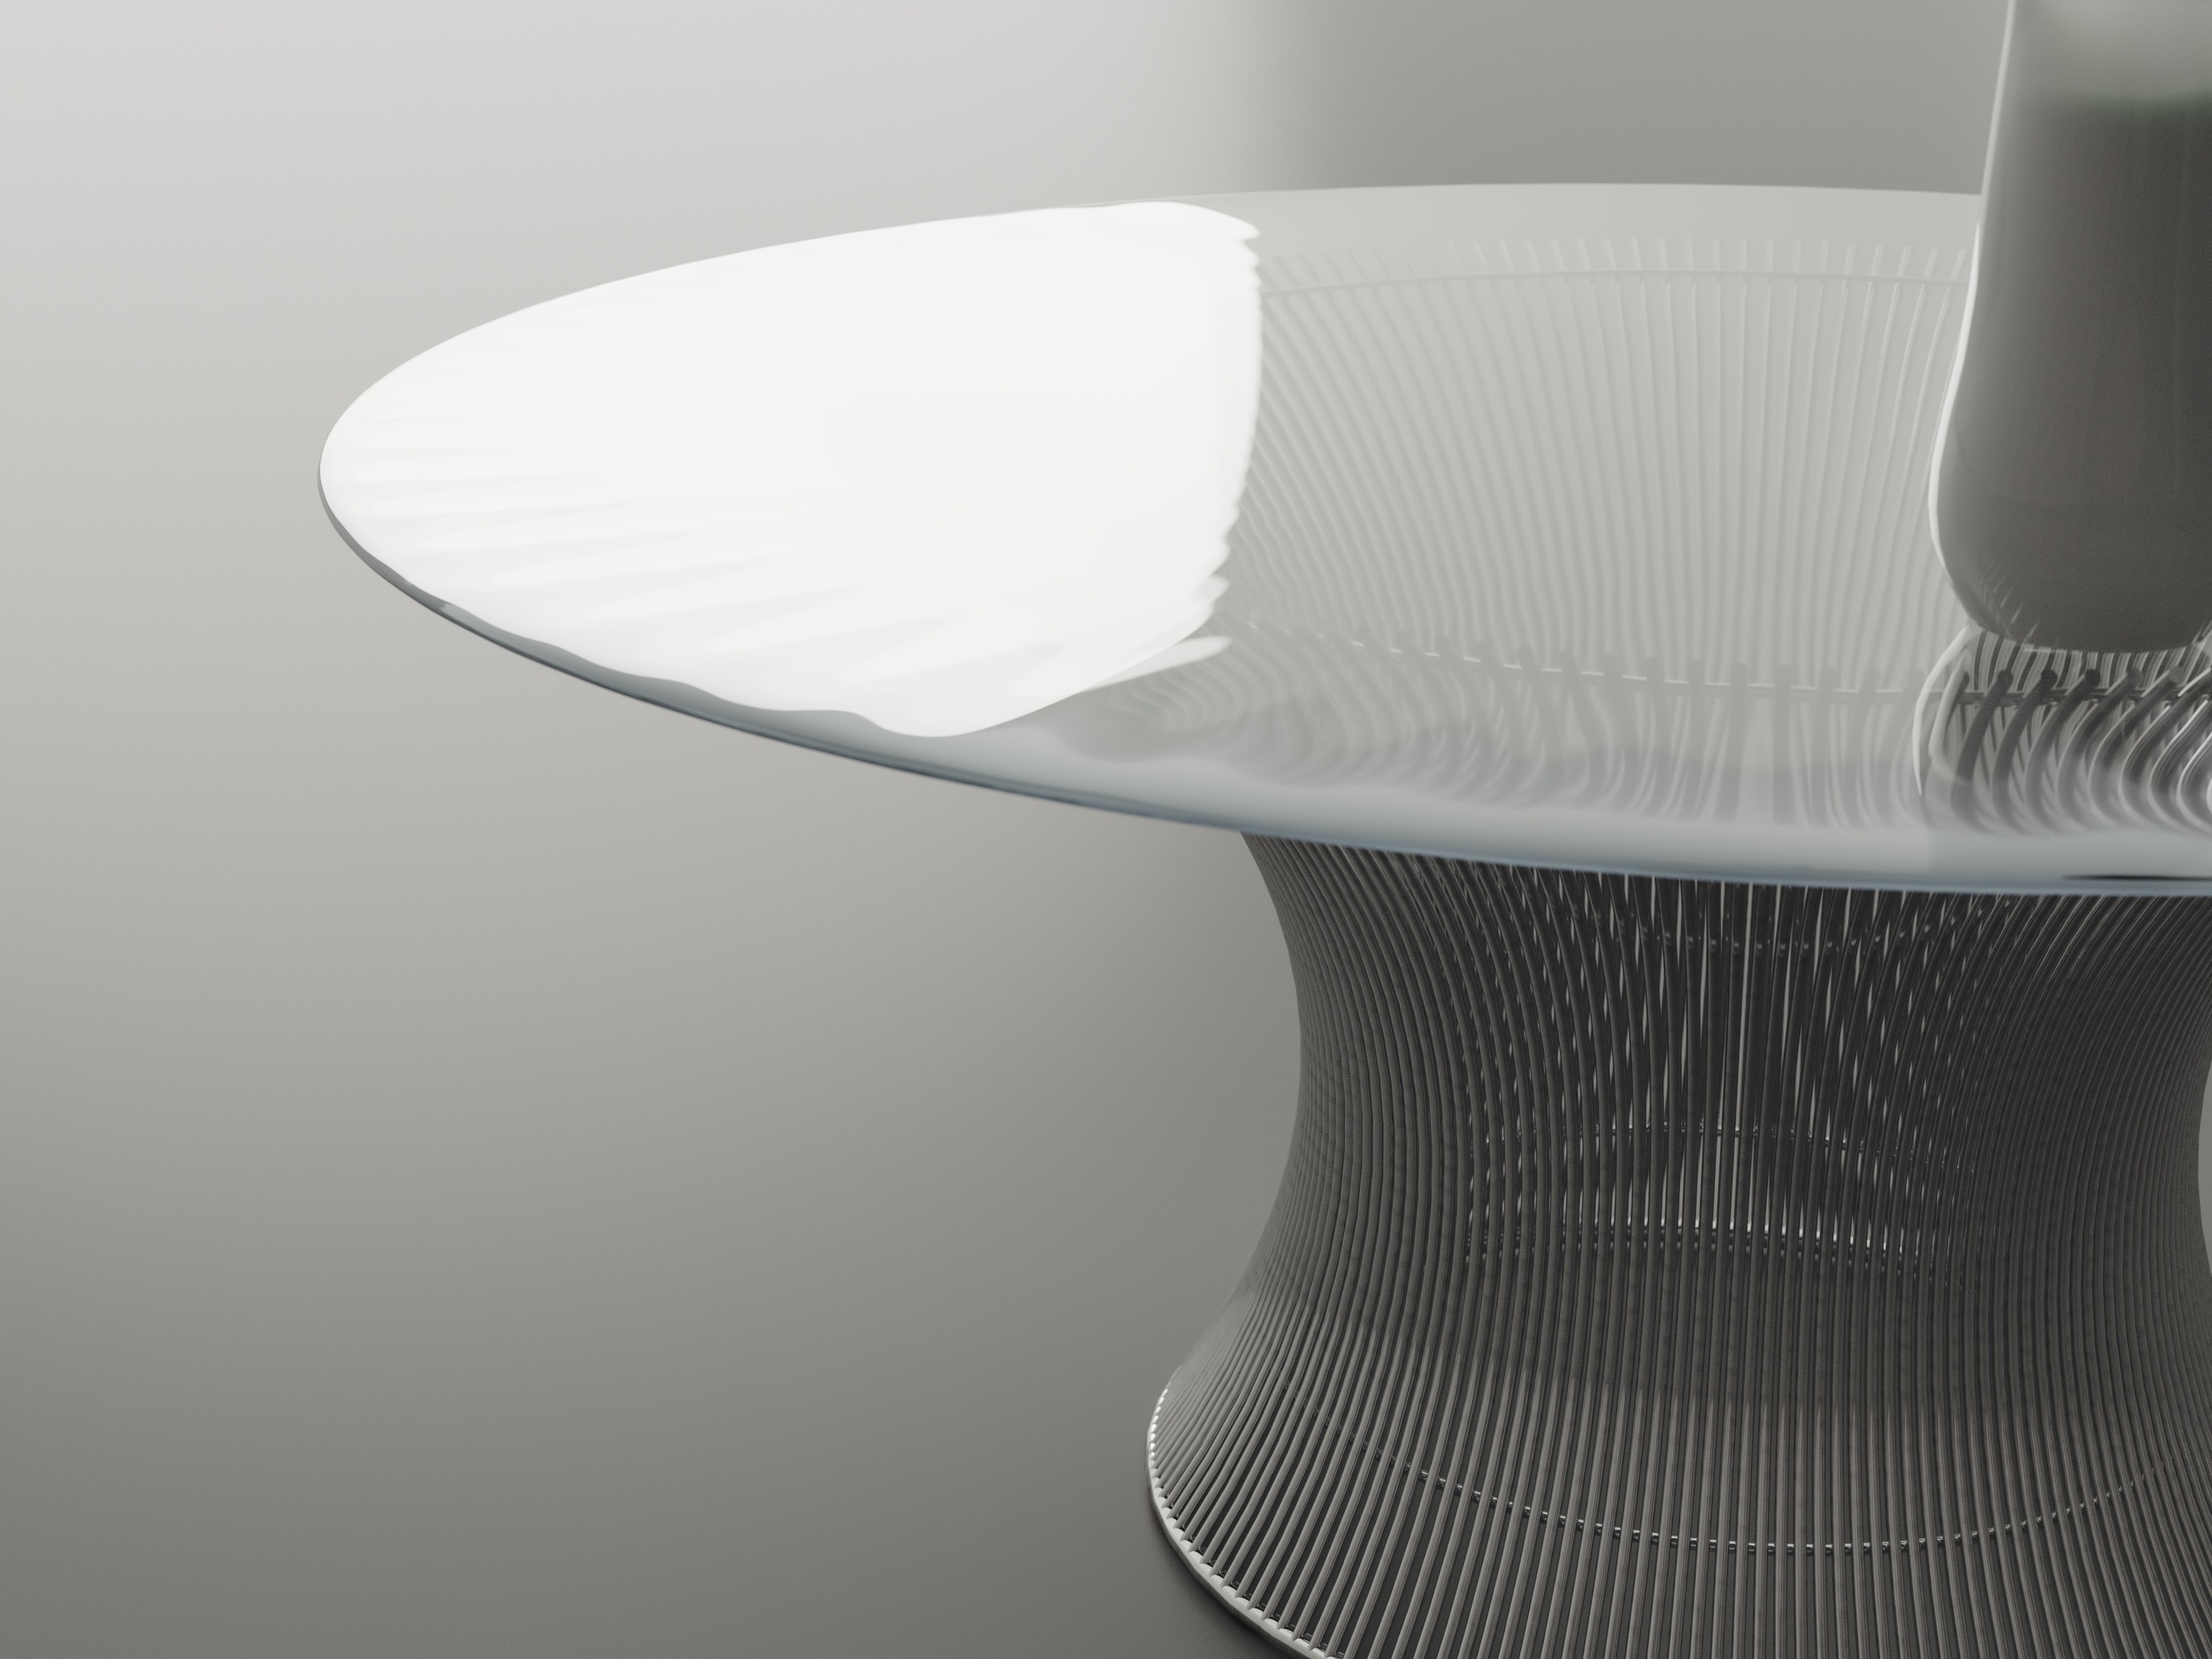 Close up photo of chrome table base